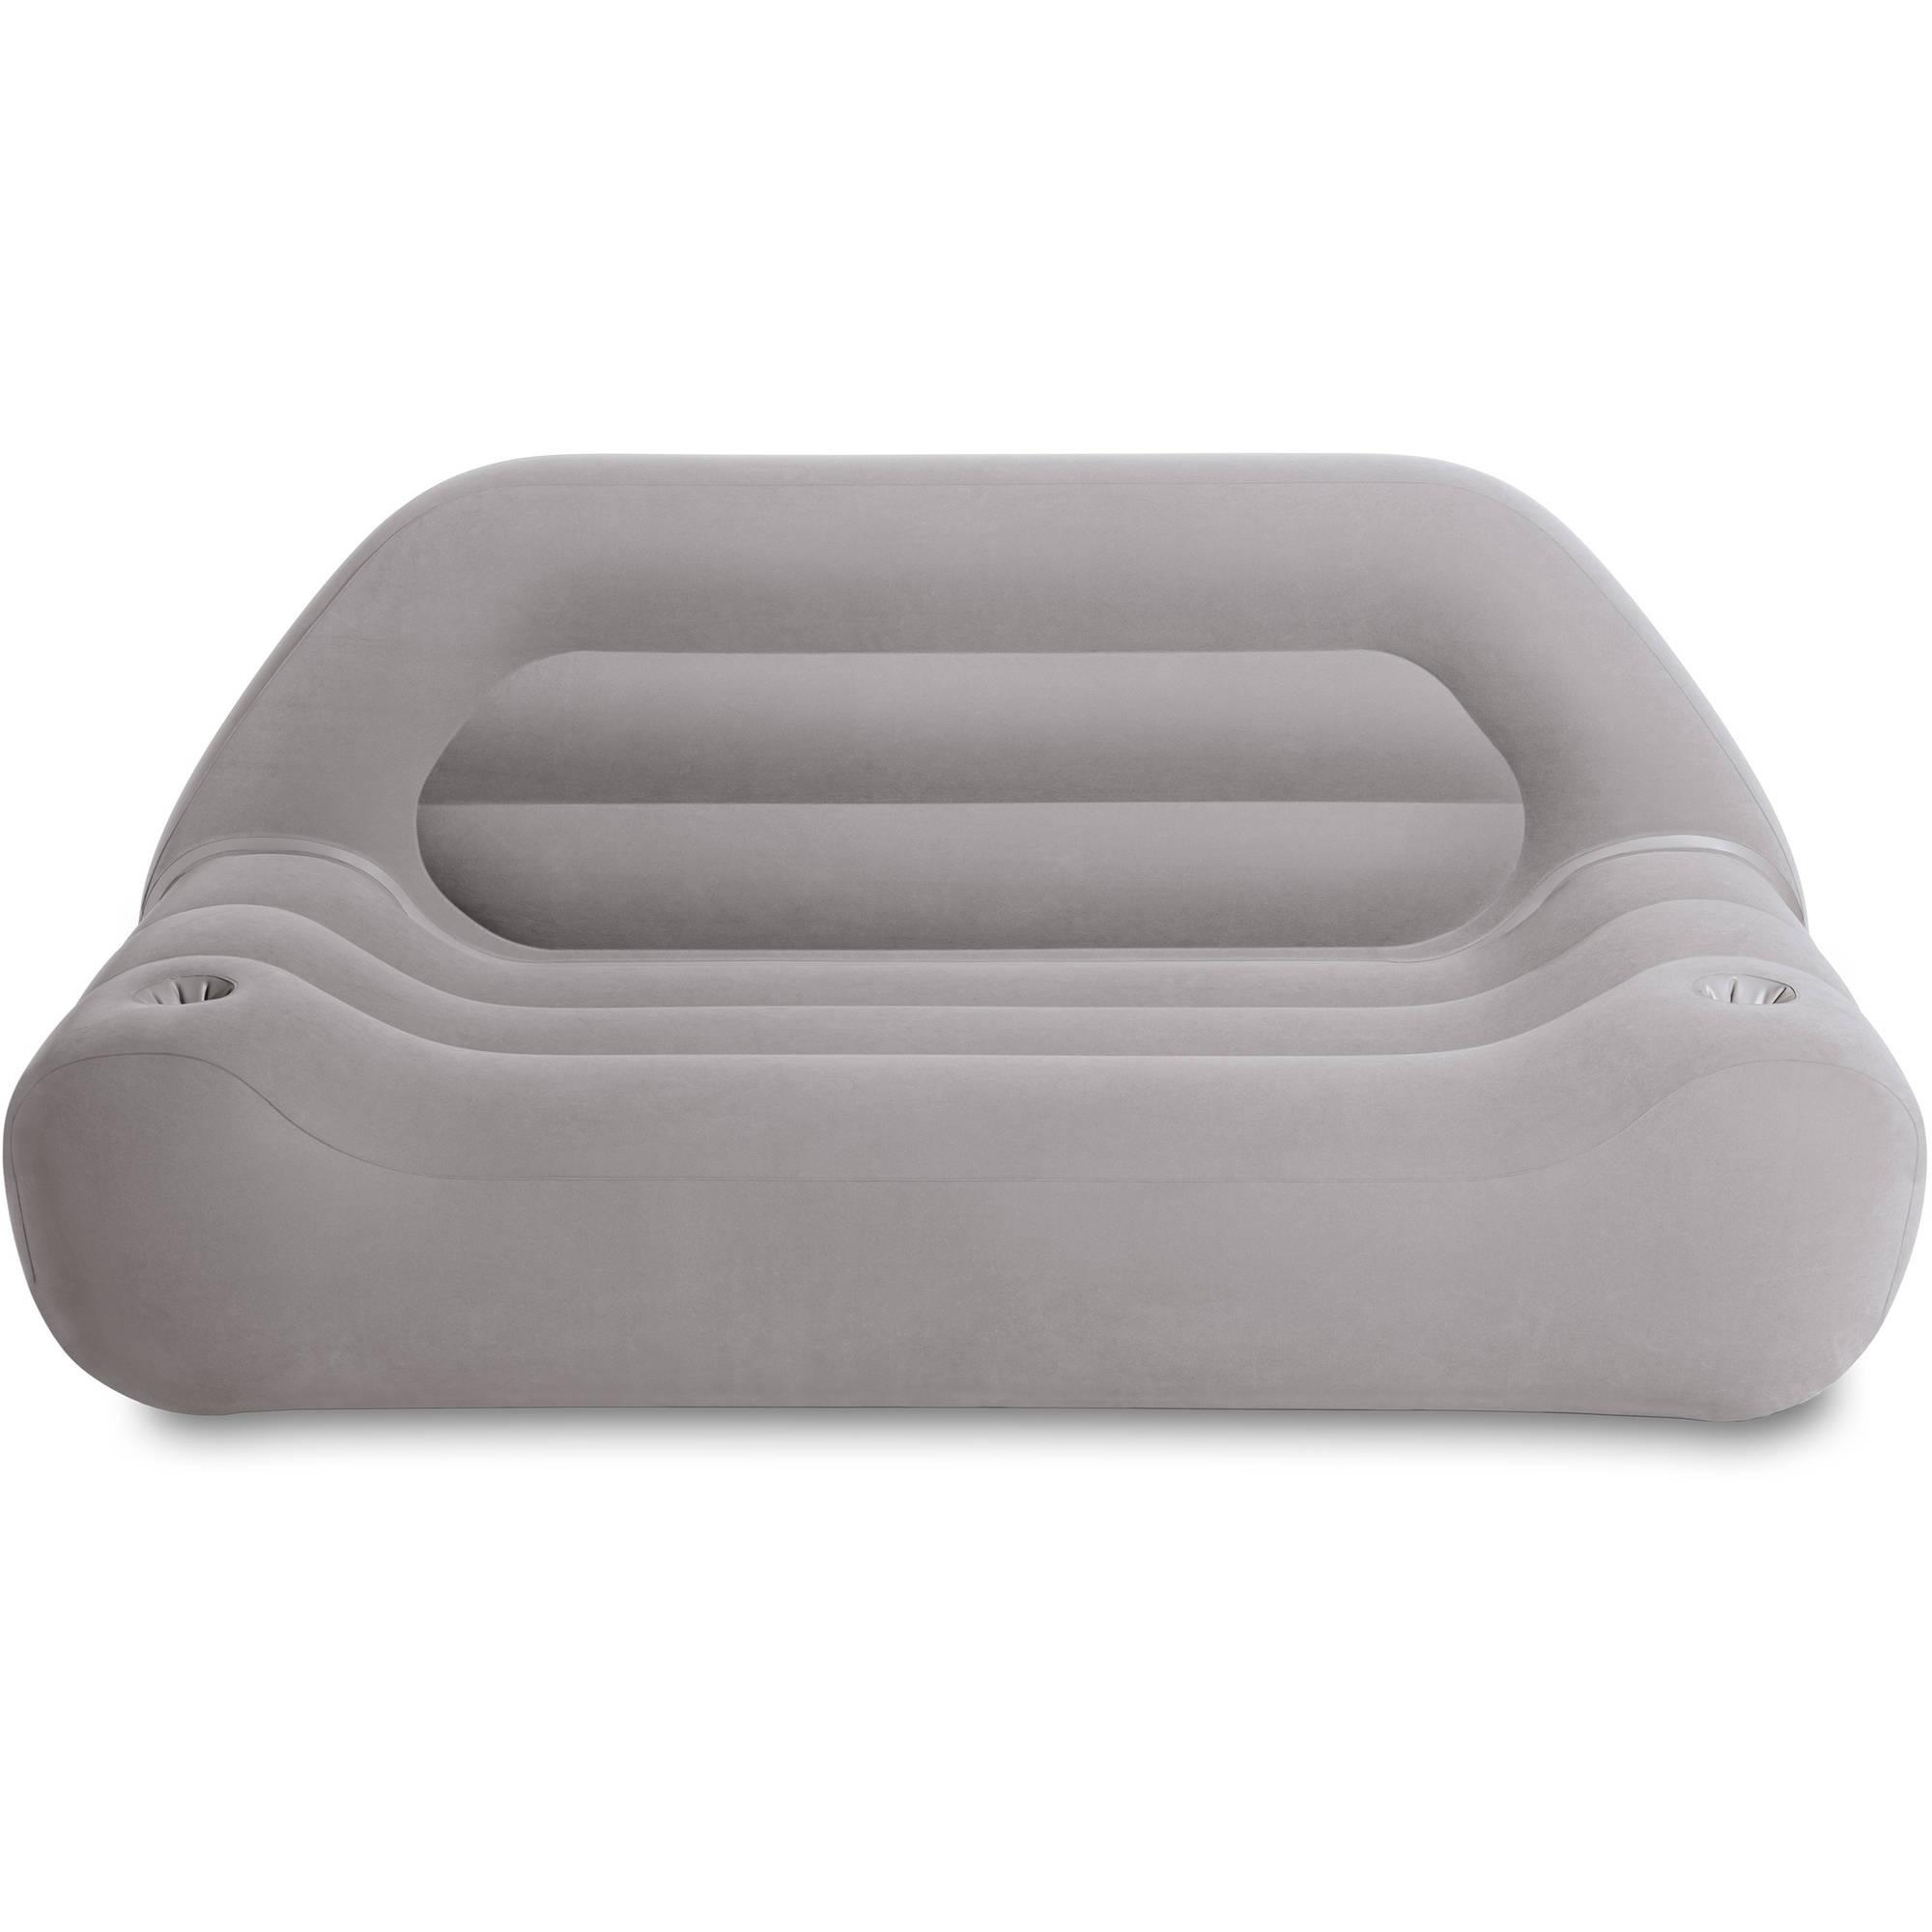 20 Choices Of Intex Inflatable Sofas Sofa Ideas